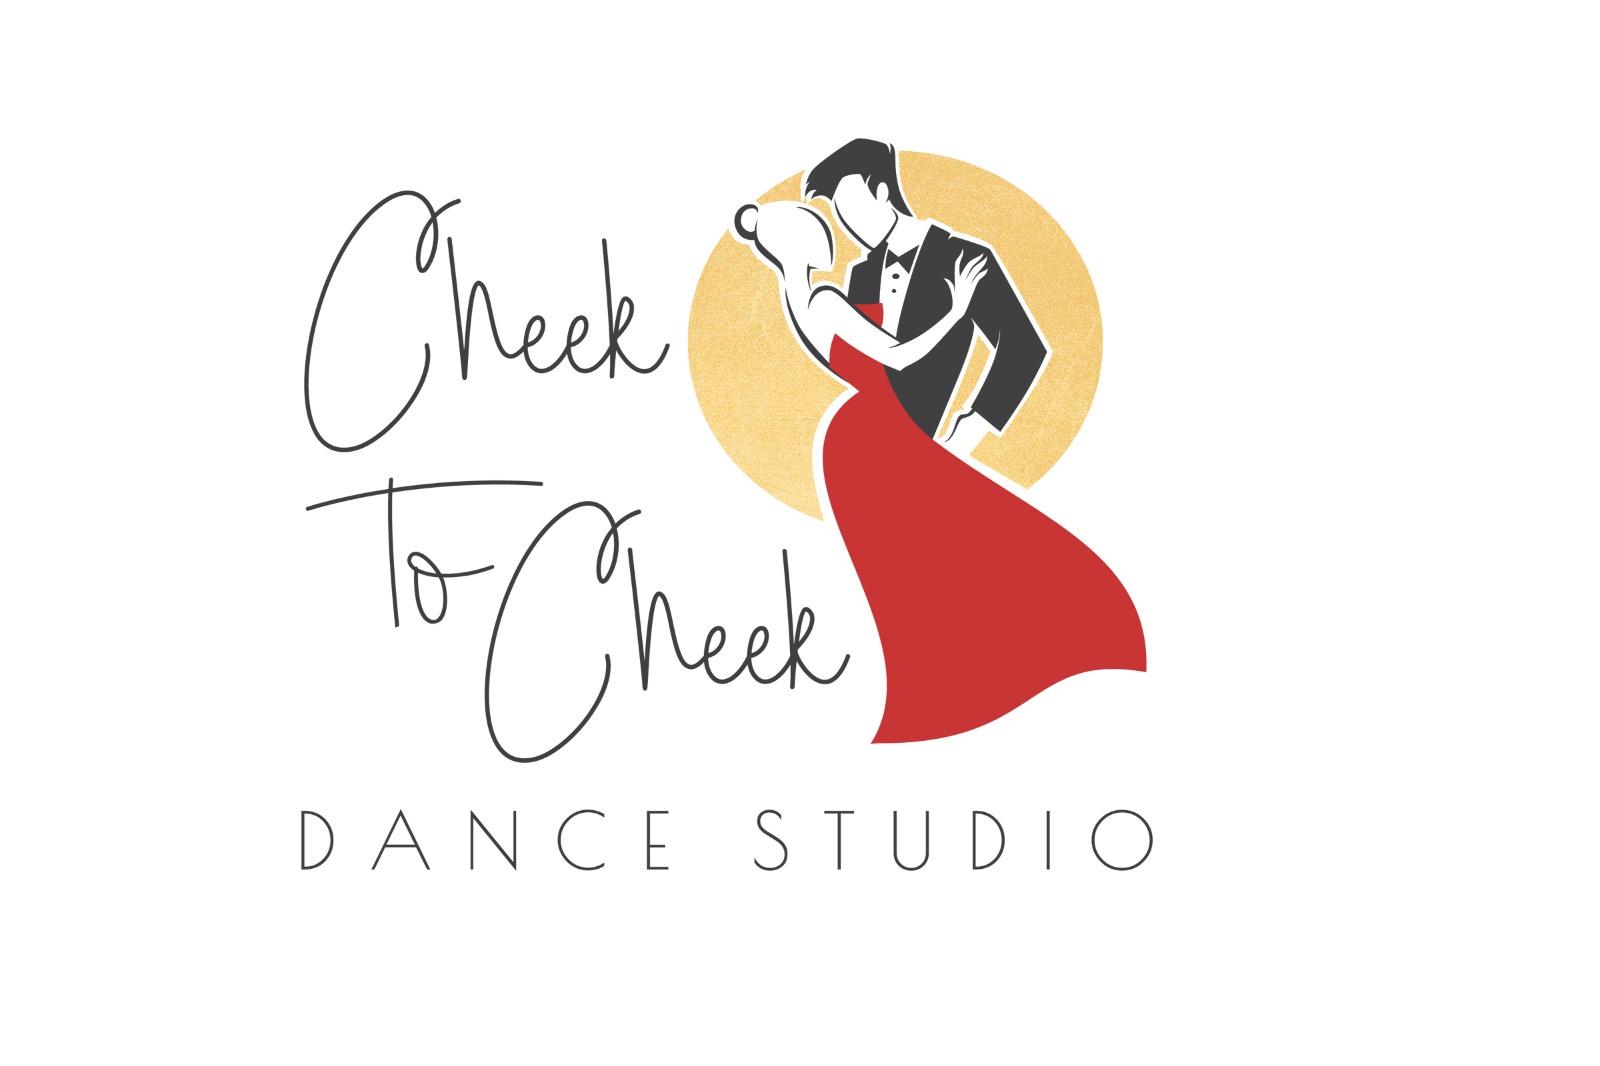 Cheek To Dance